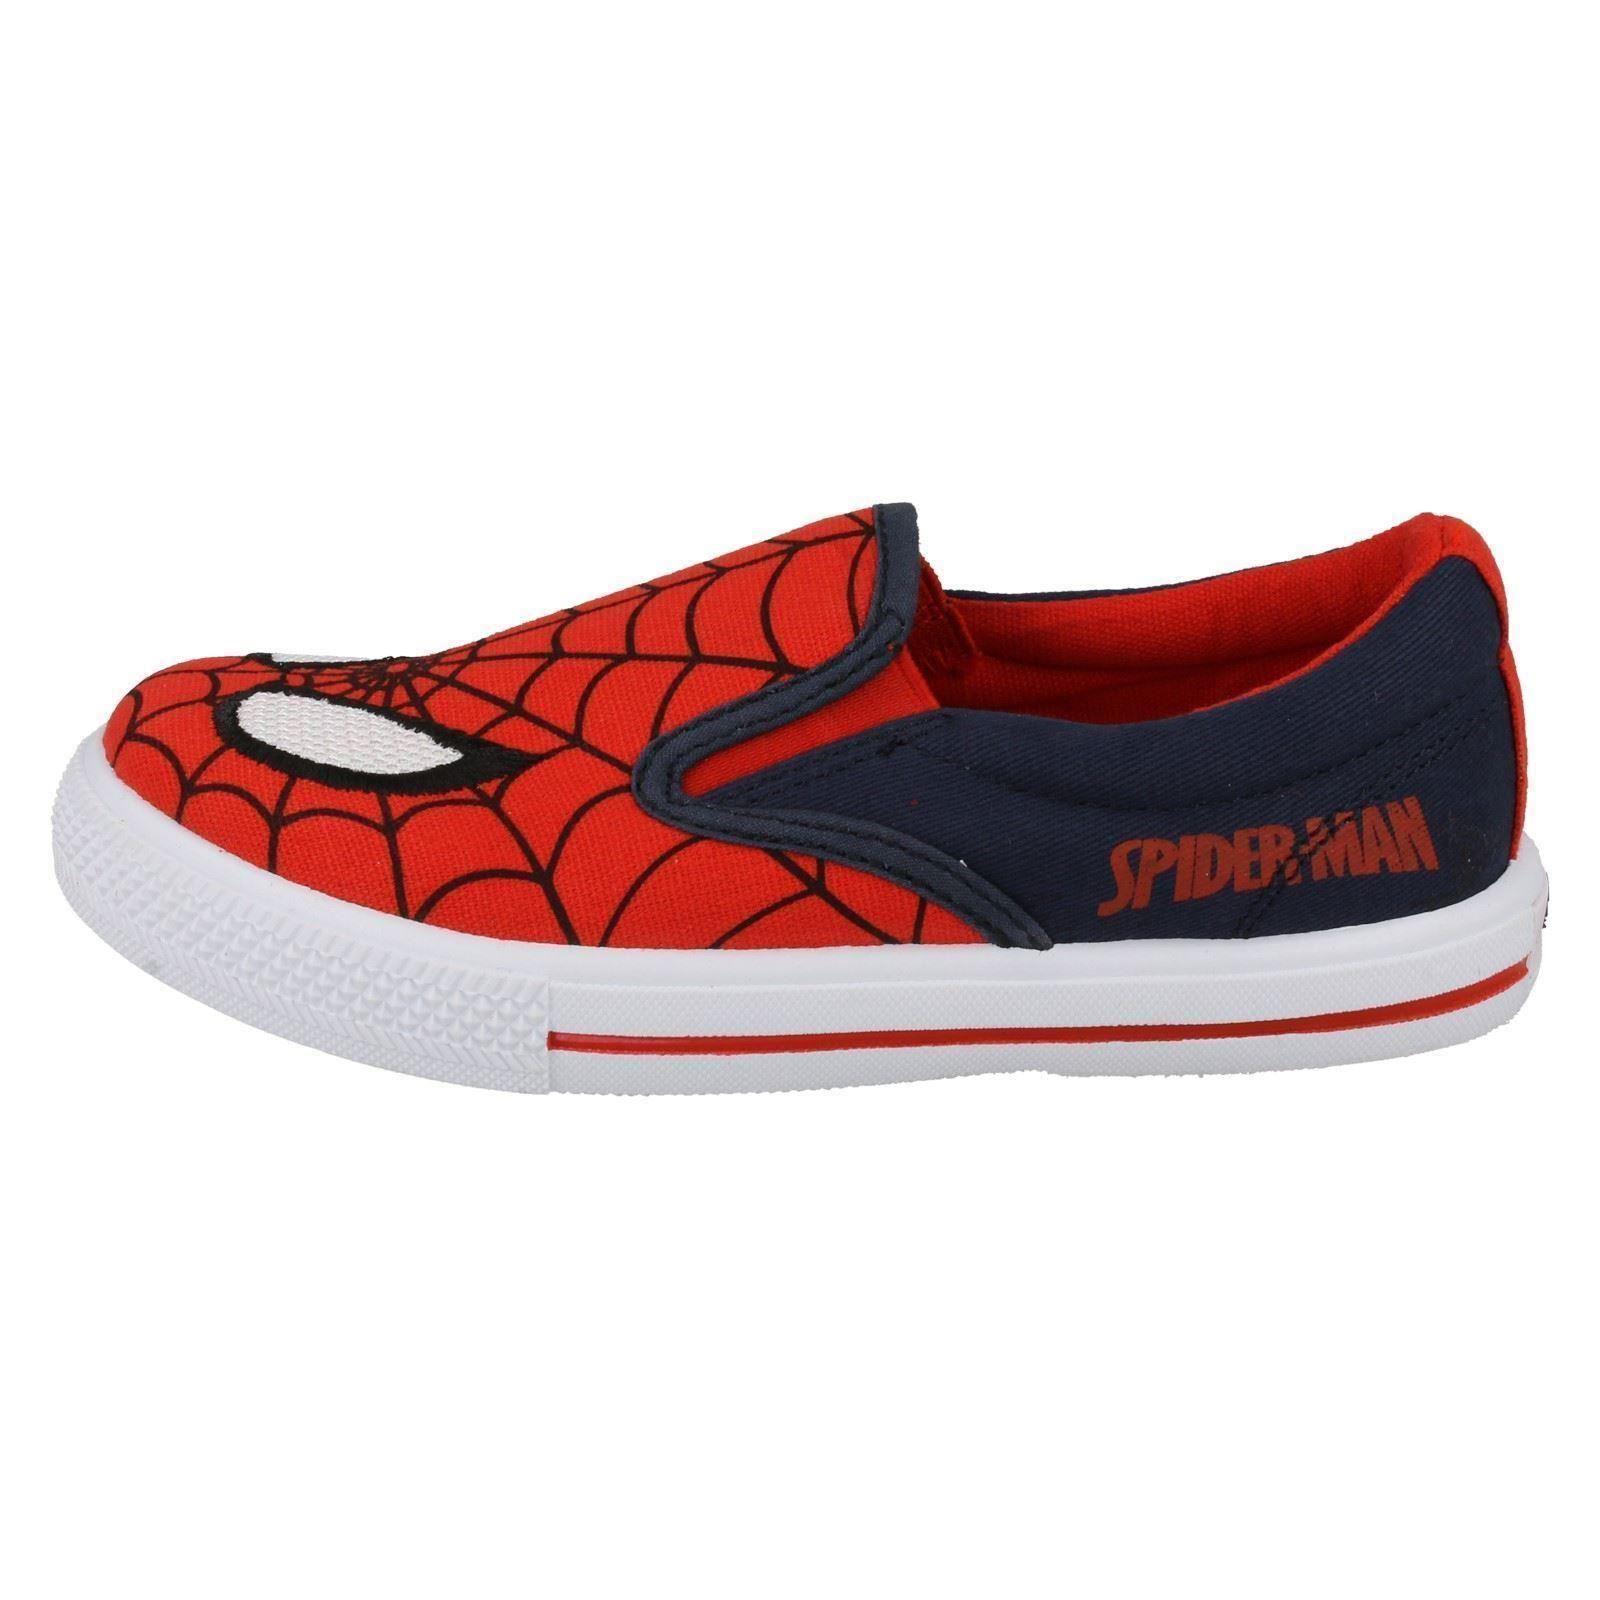 Marvel Spiderman Chicos-carlbury Slip On Lona